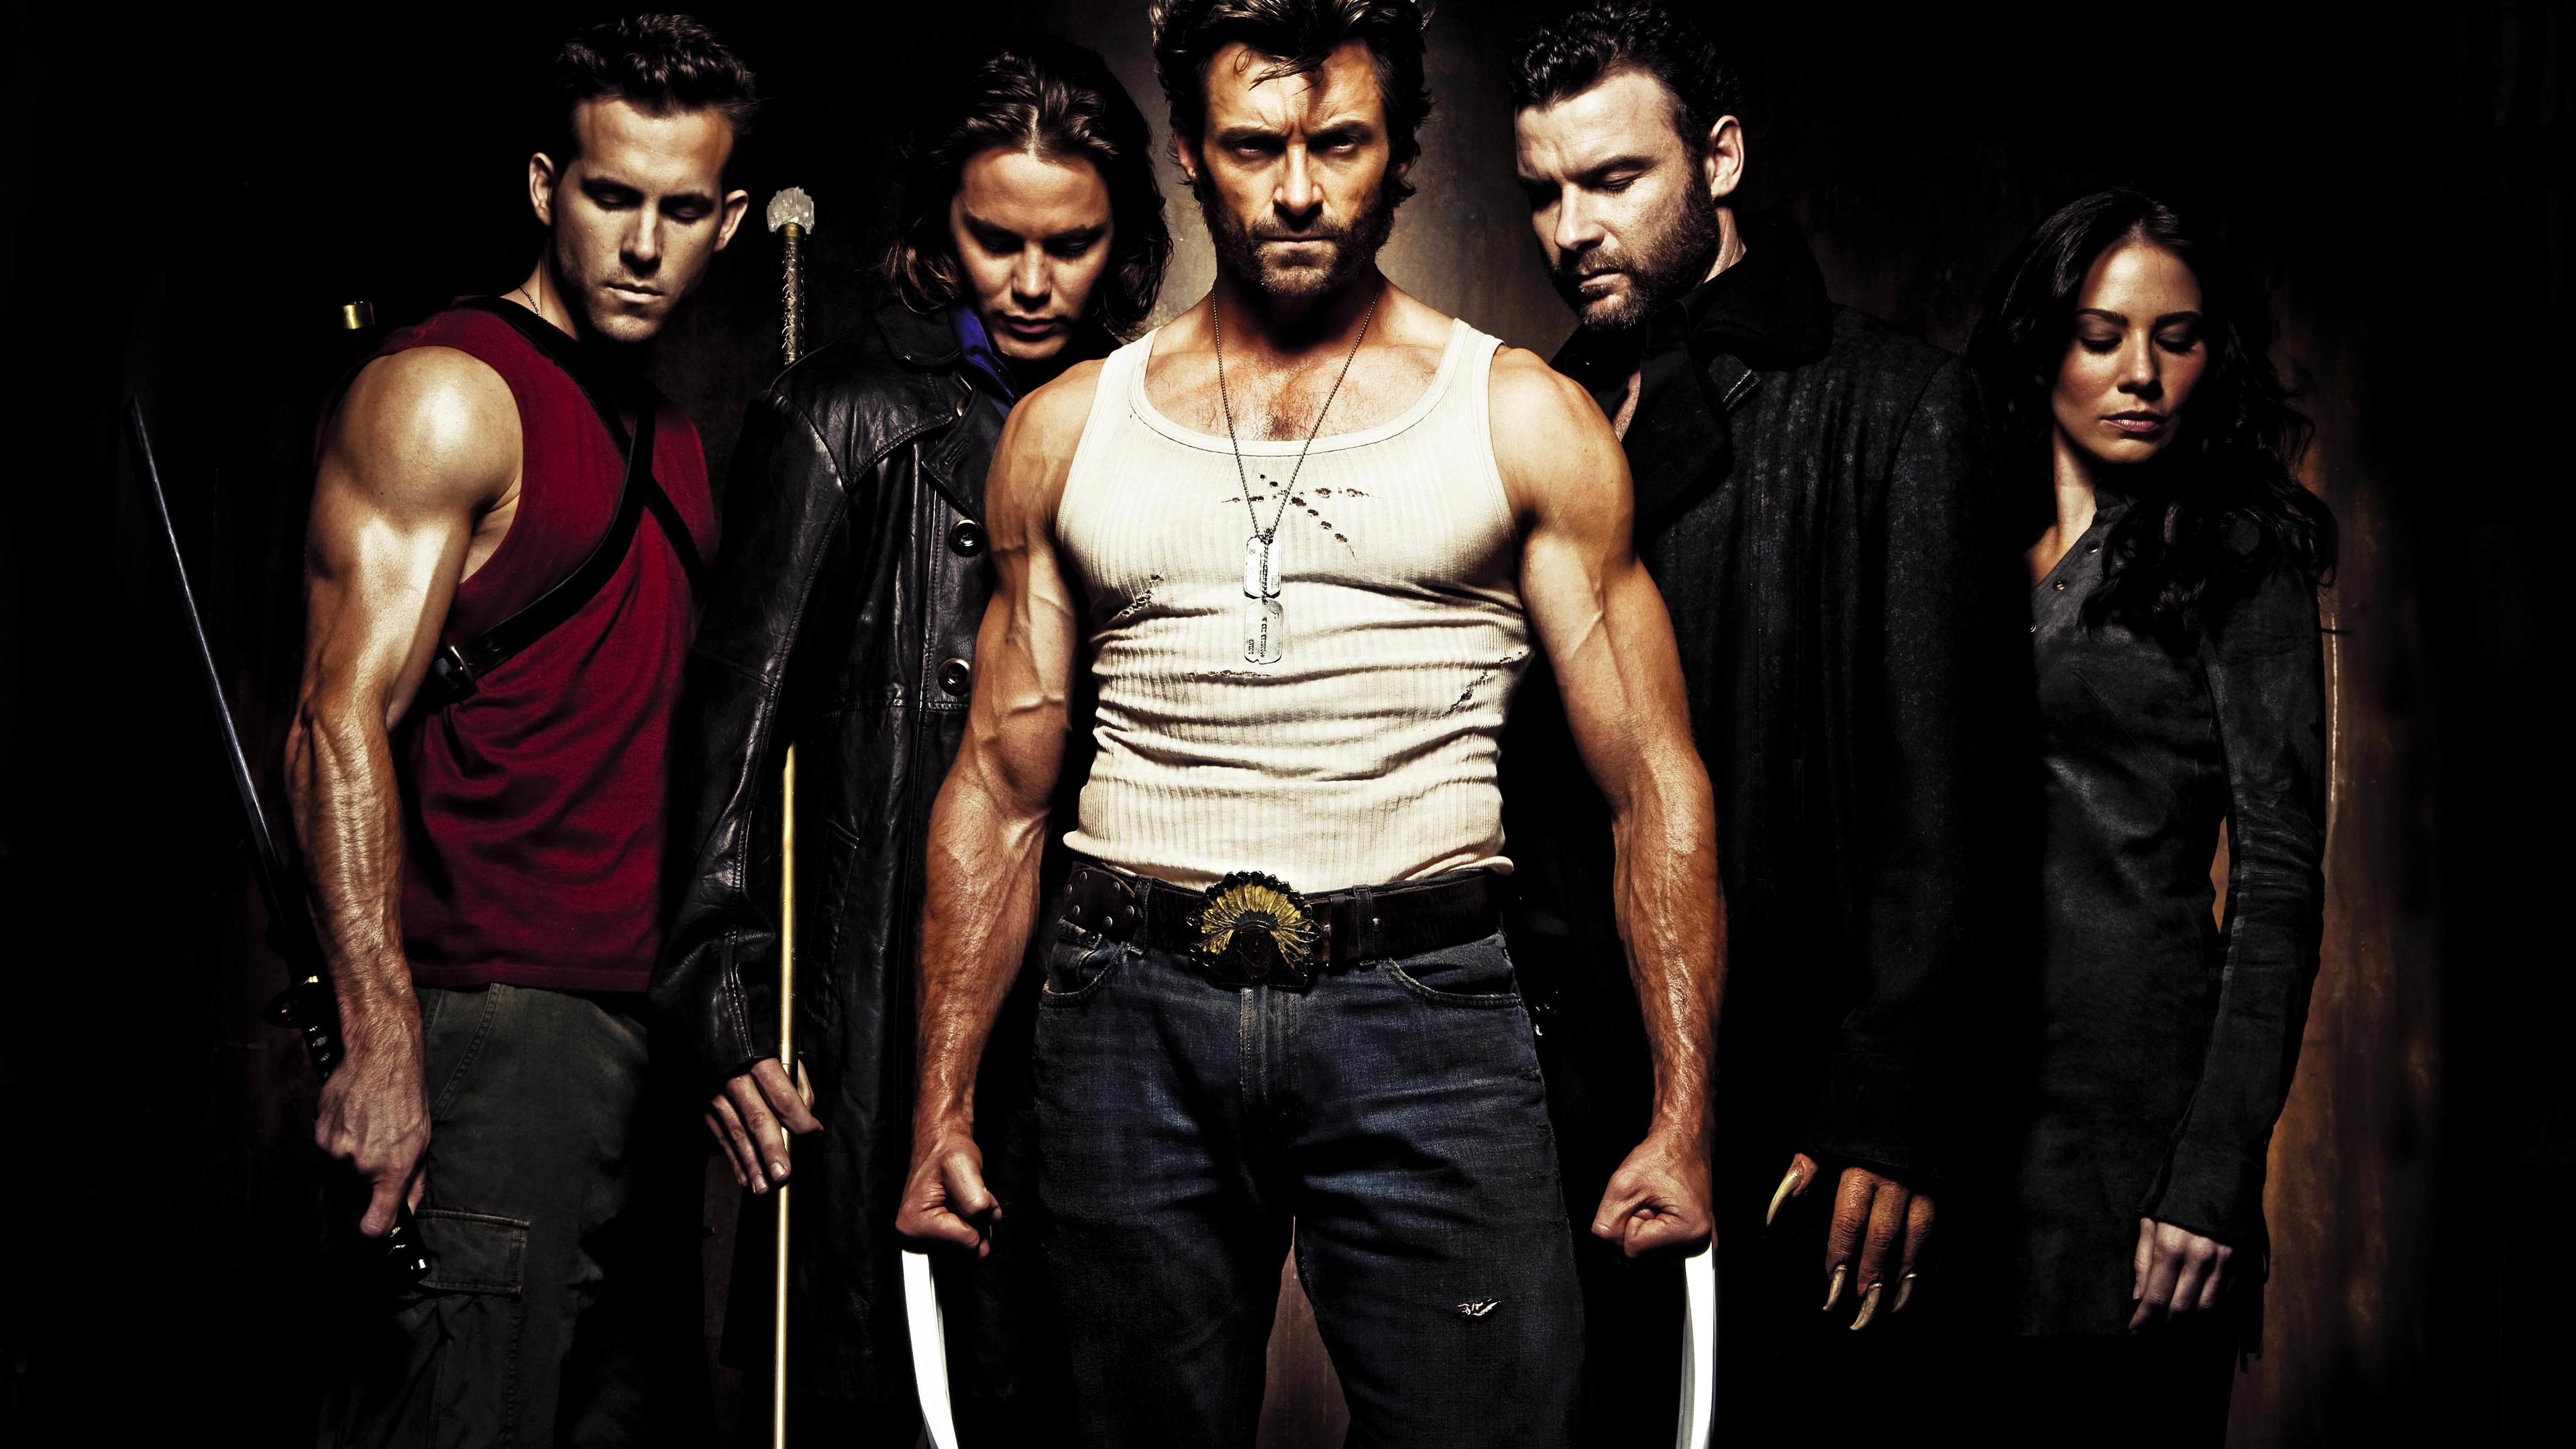 x men origins wolverine 4k 1552231747 - X Men Origins Wolverine 4k - x men wallpapers, movies wallpapers, hd-wallpapers, 5k wallpapers, 4k-wallpapers